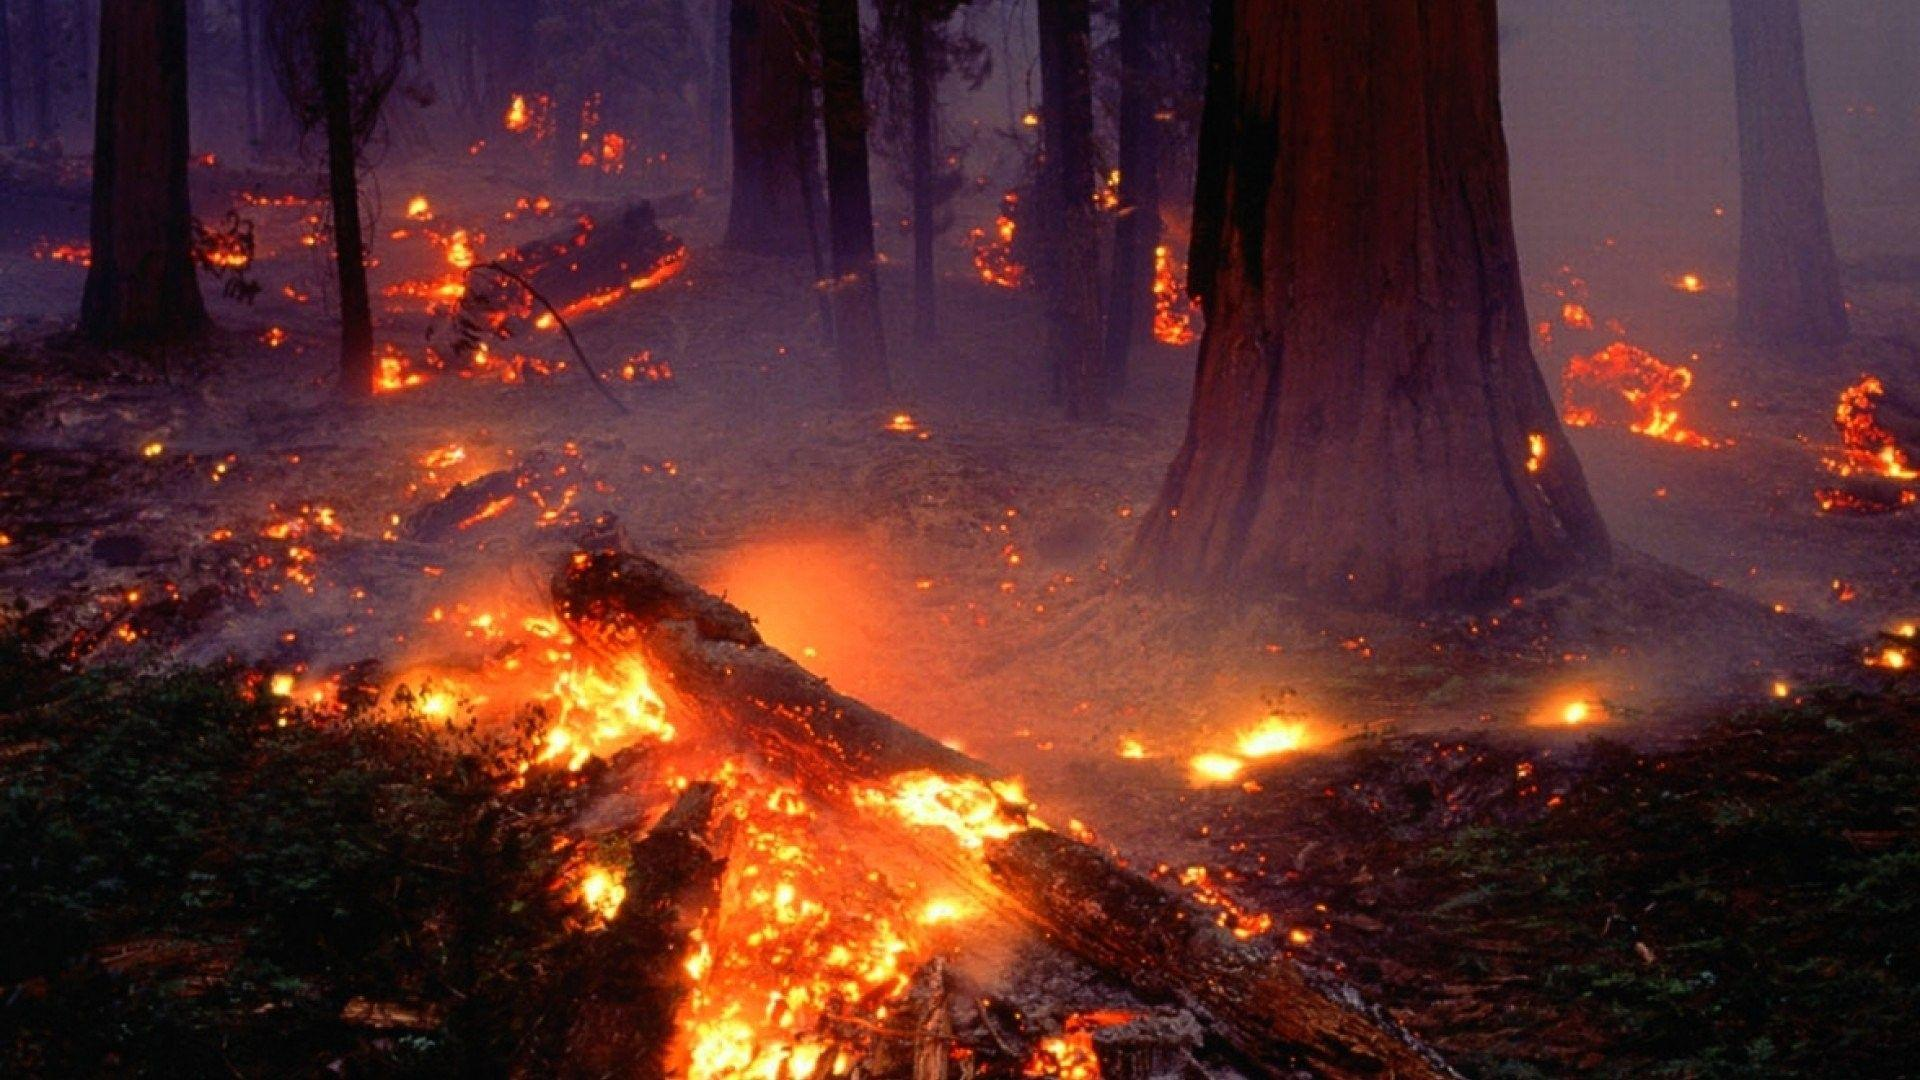 fire apocalypse background - photo #7